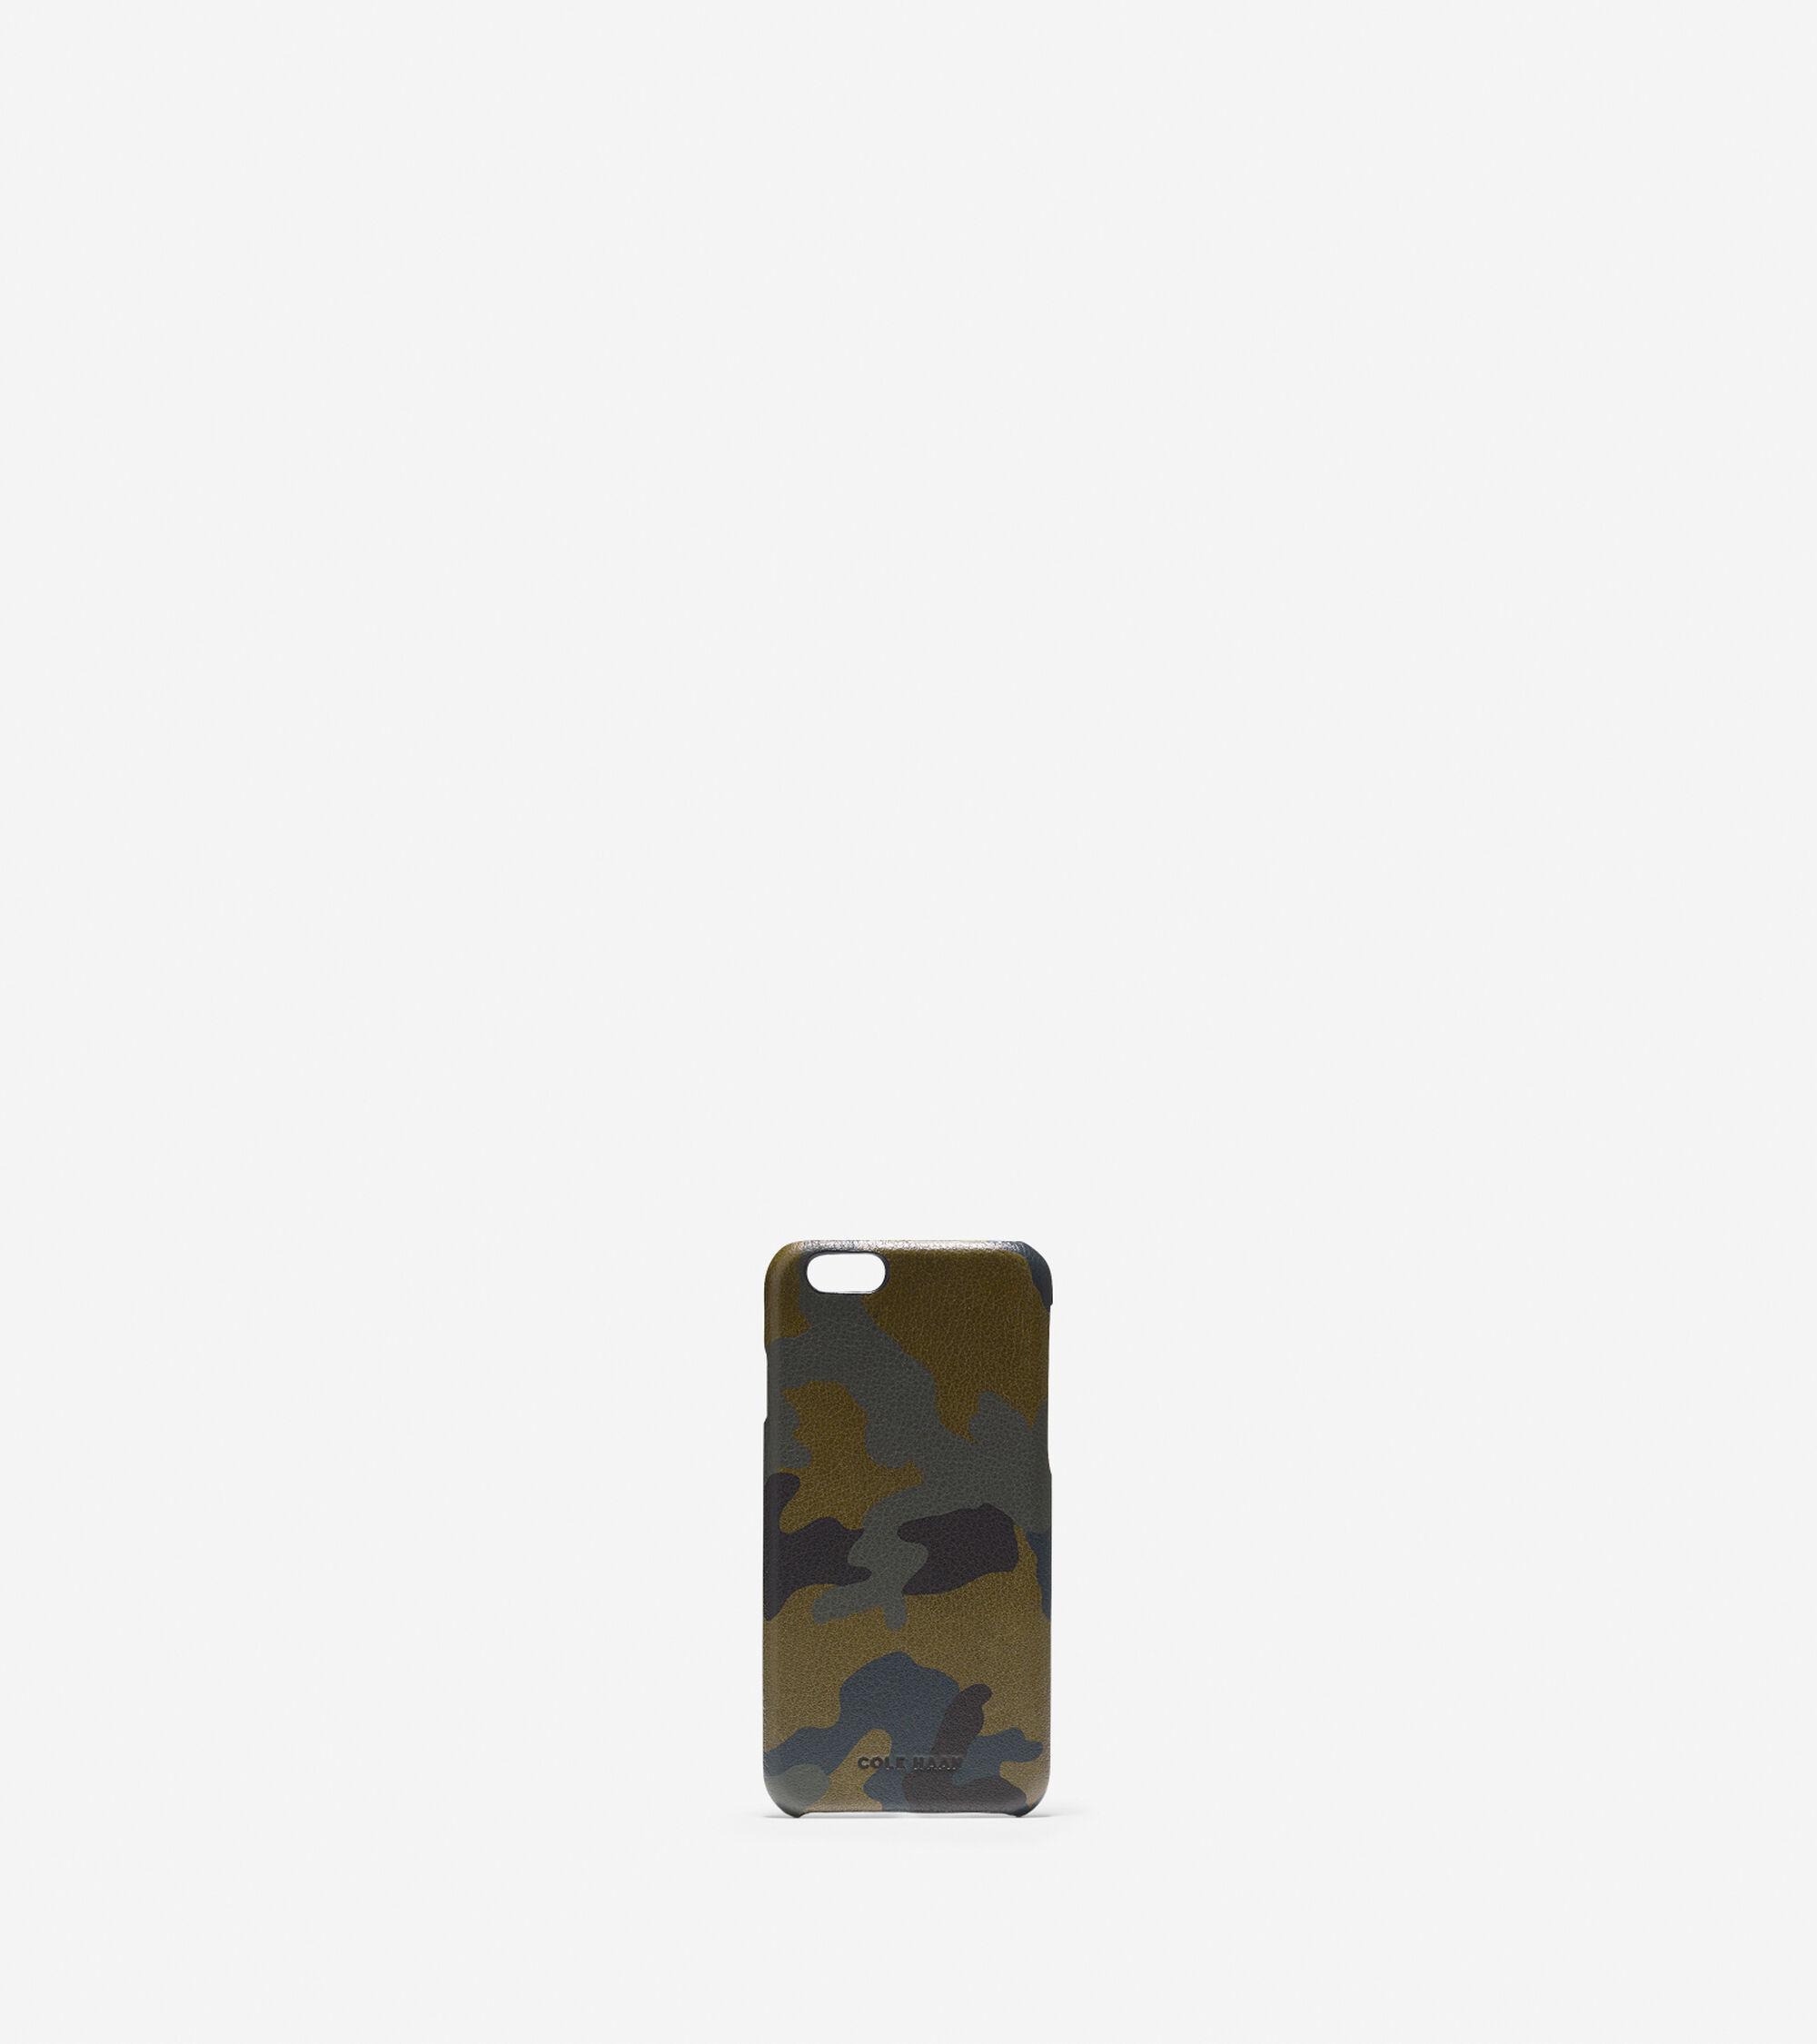 Accessories > Camo iPhone 6 Case